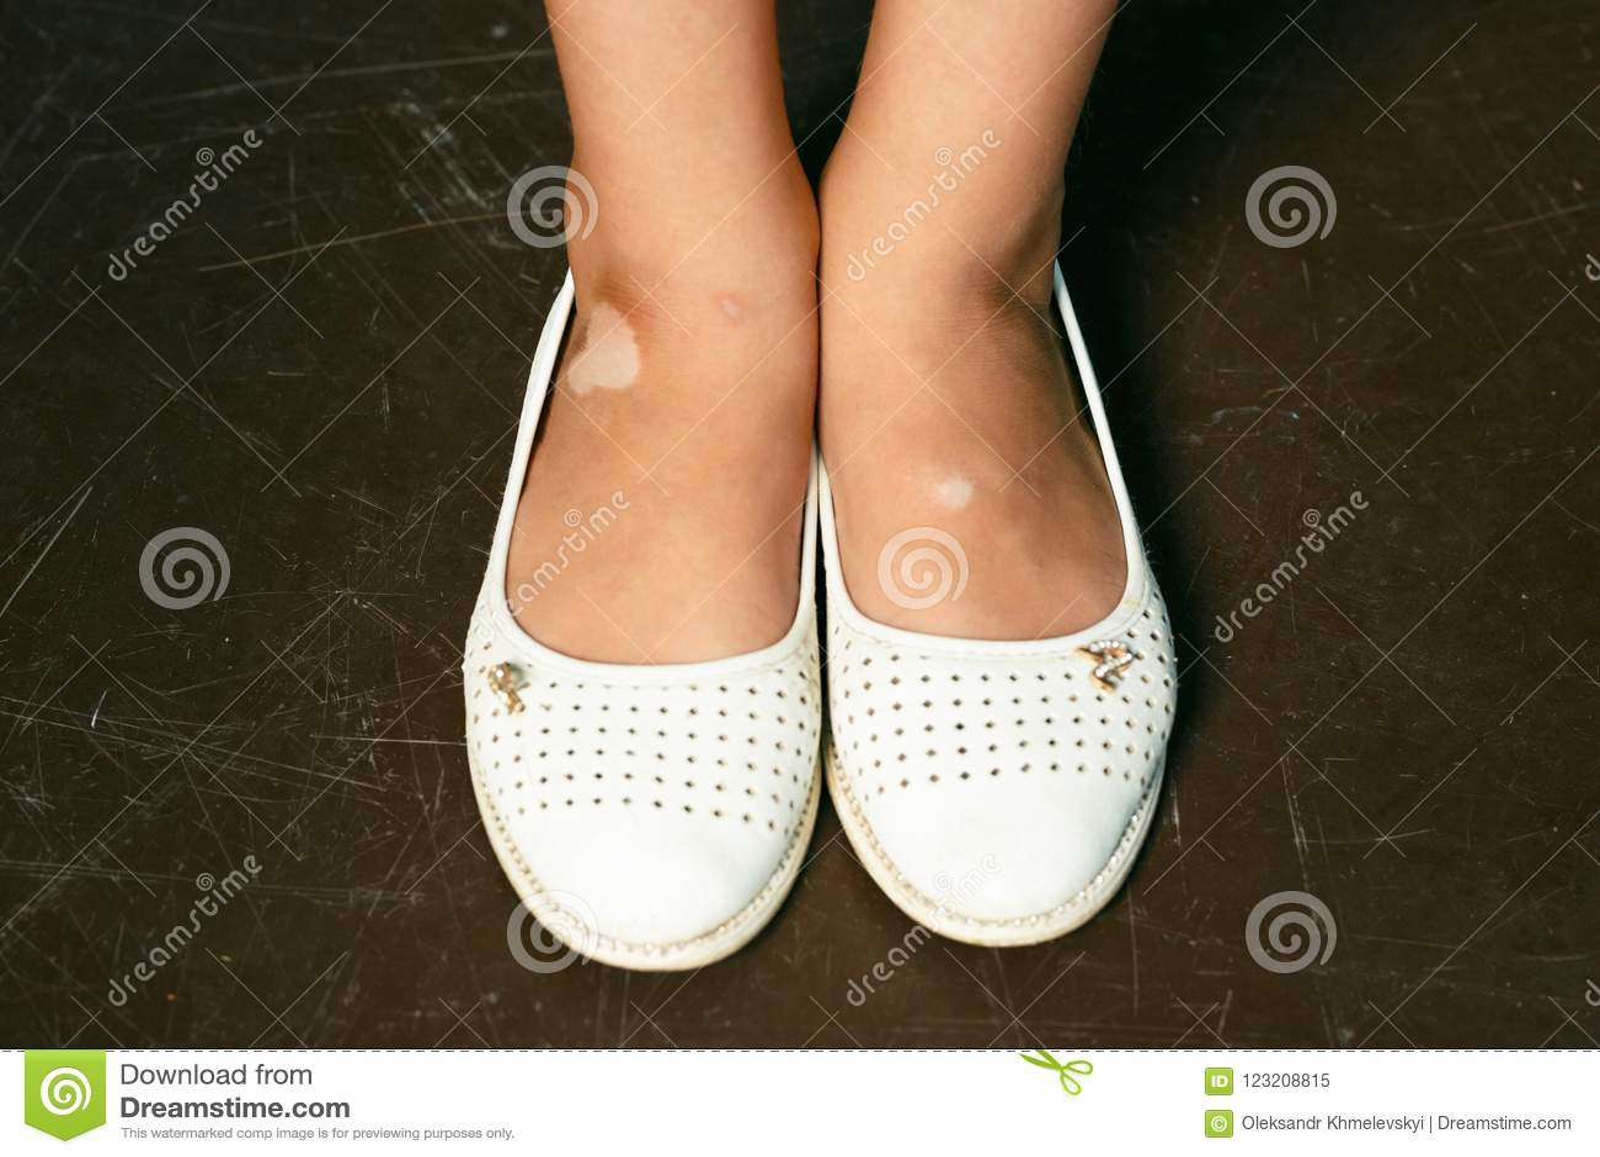 Child Legs With Vitiligo At Skin Stock Image Image Of Condition Leucopathia 123208815